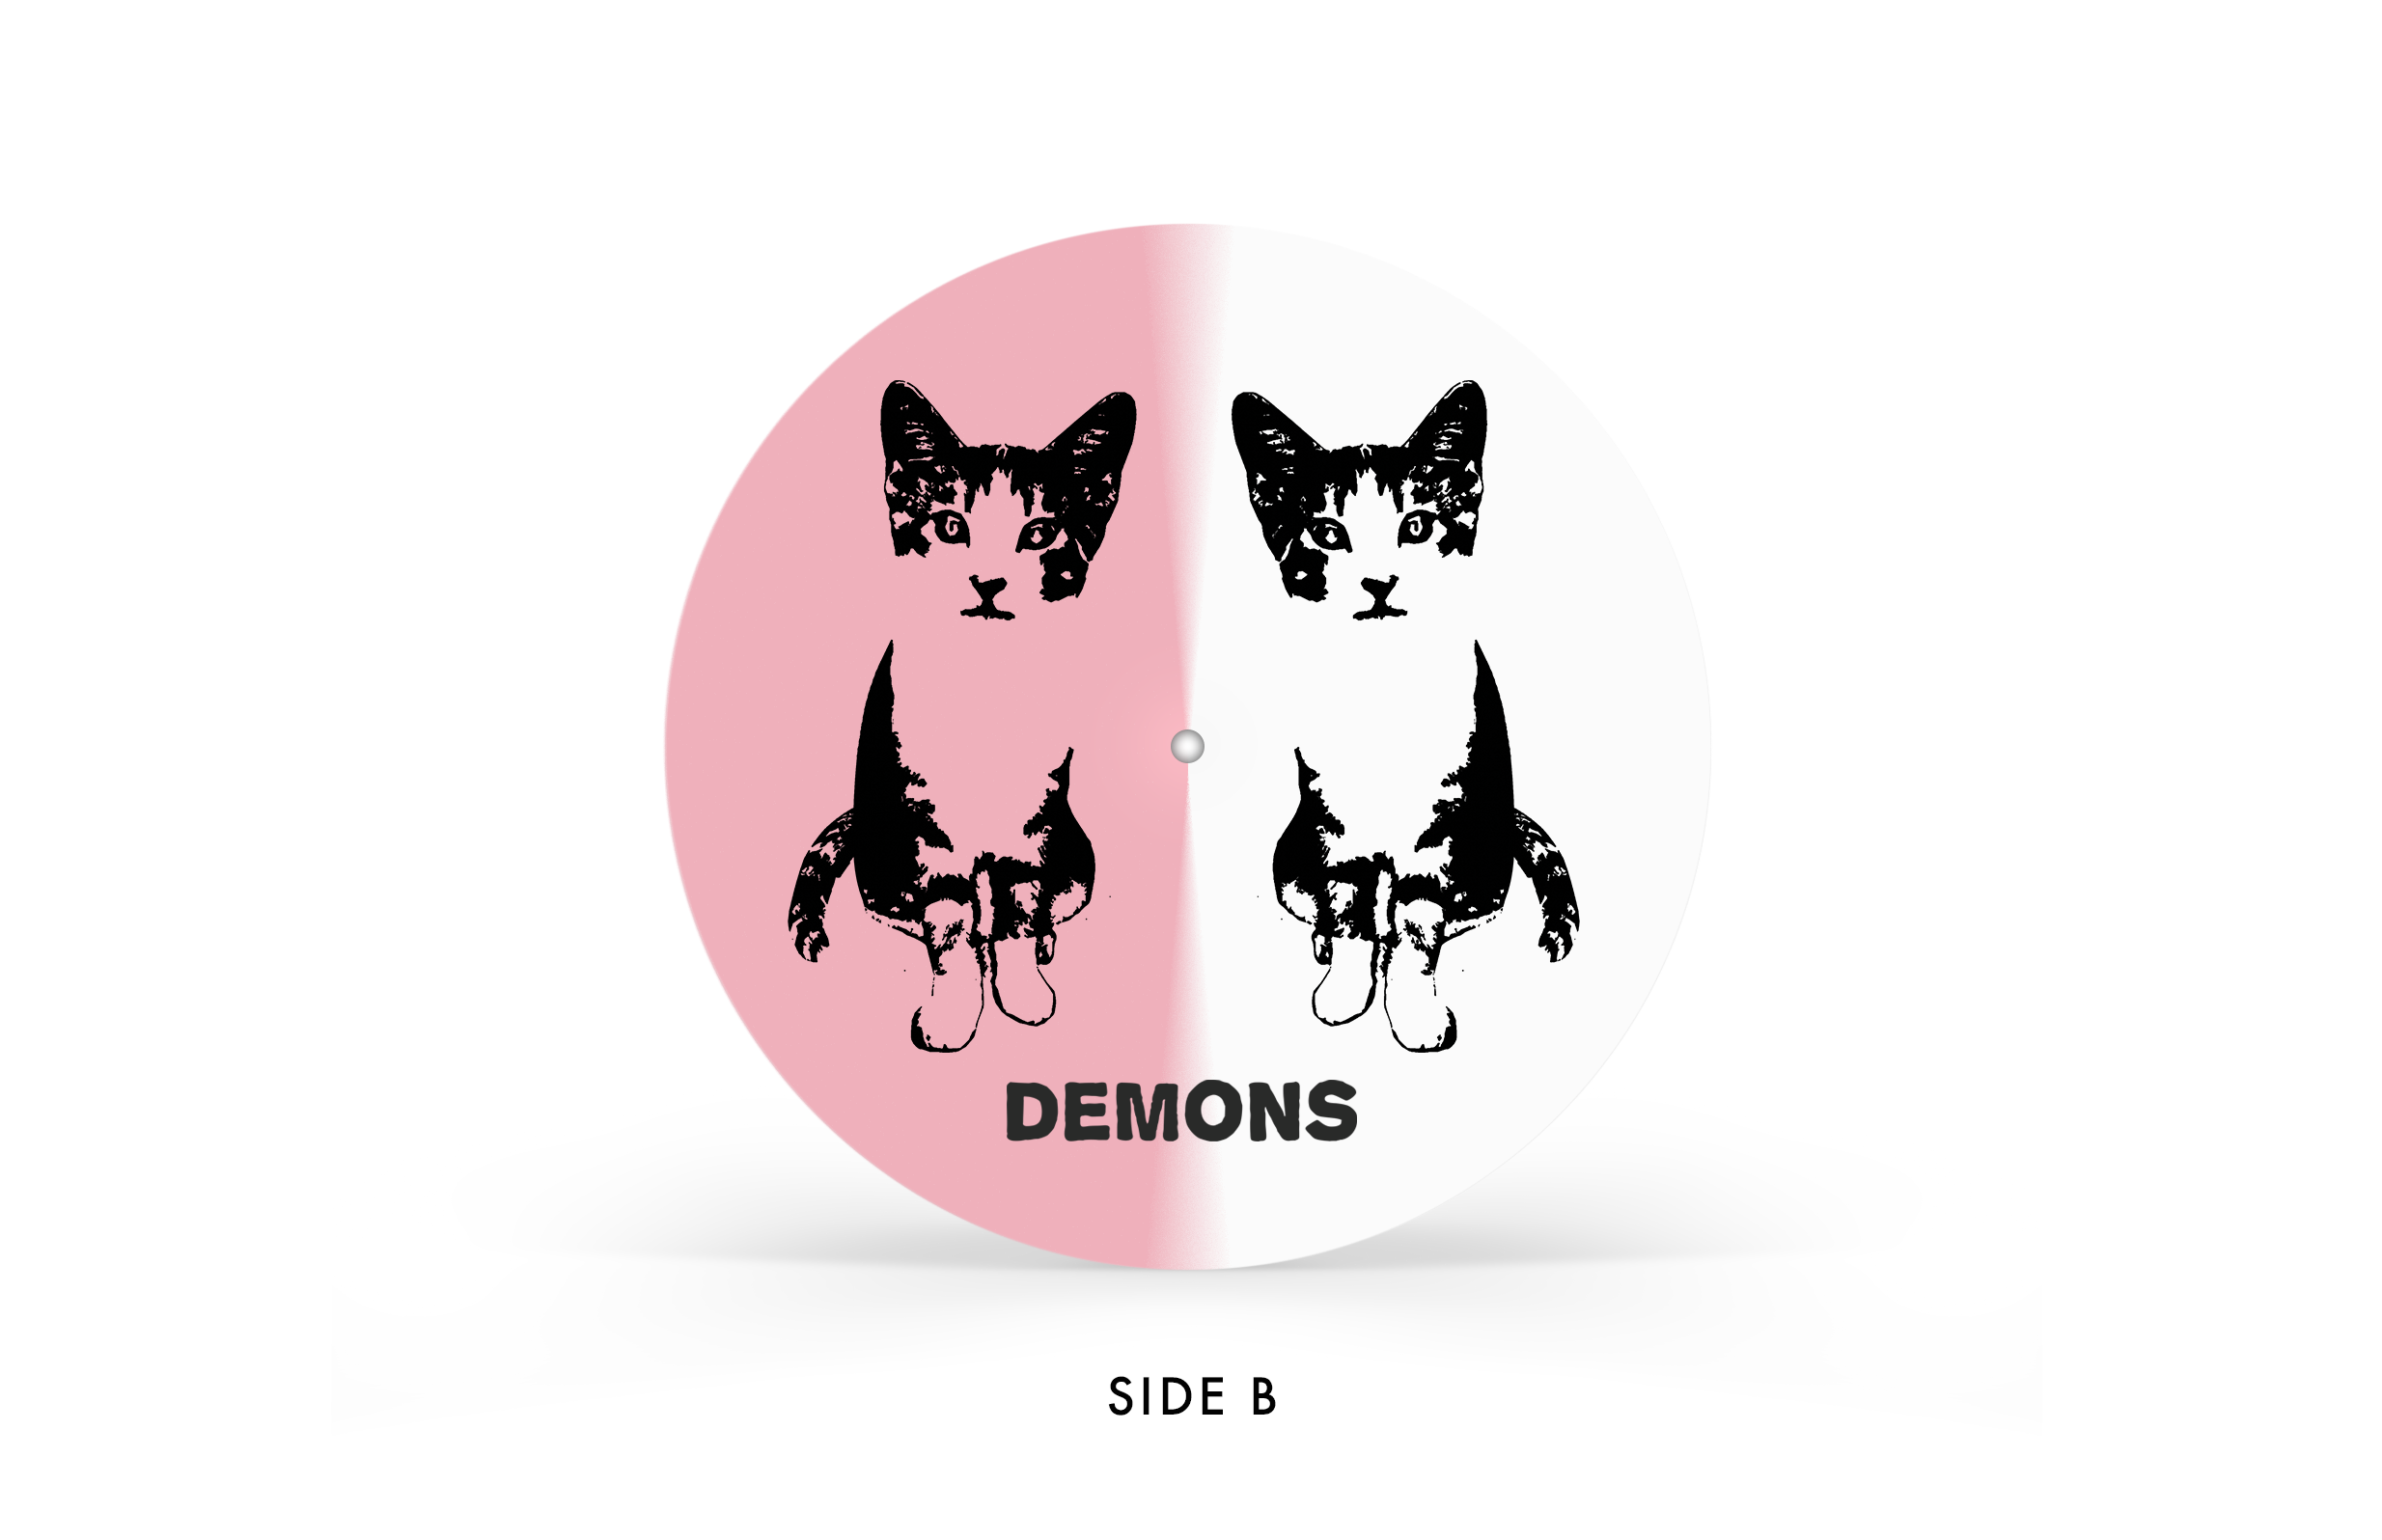 Demons -